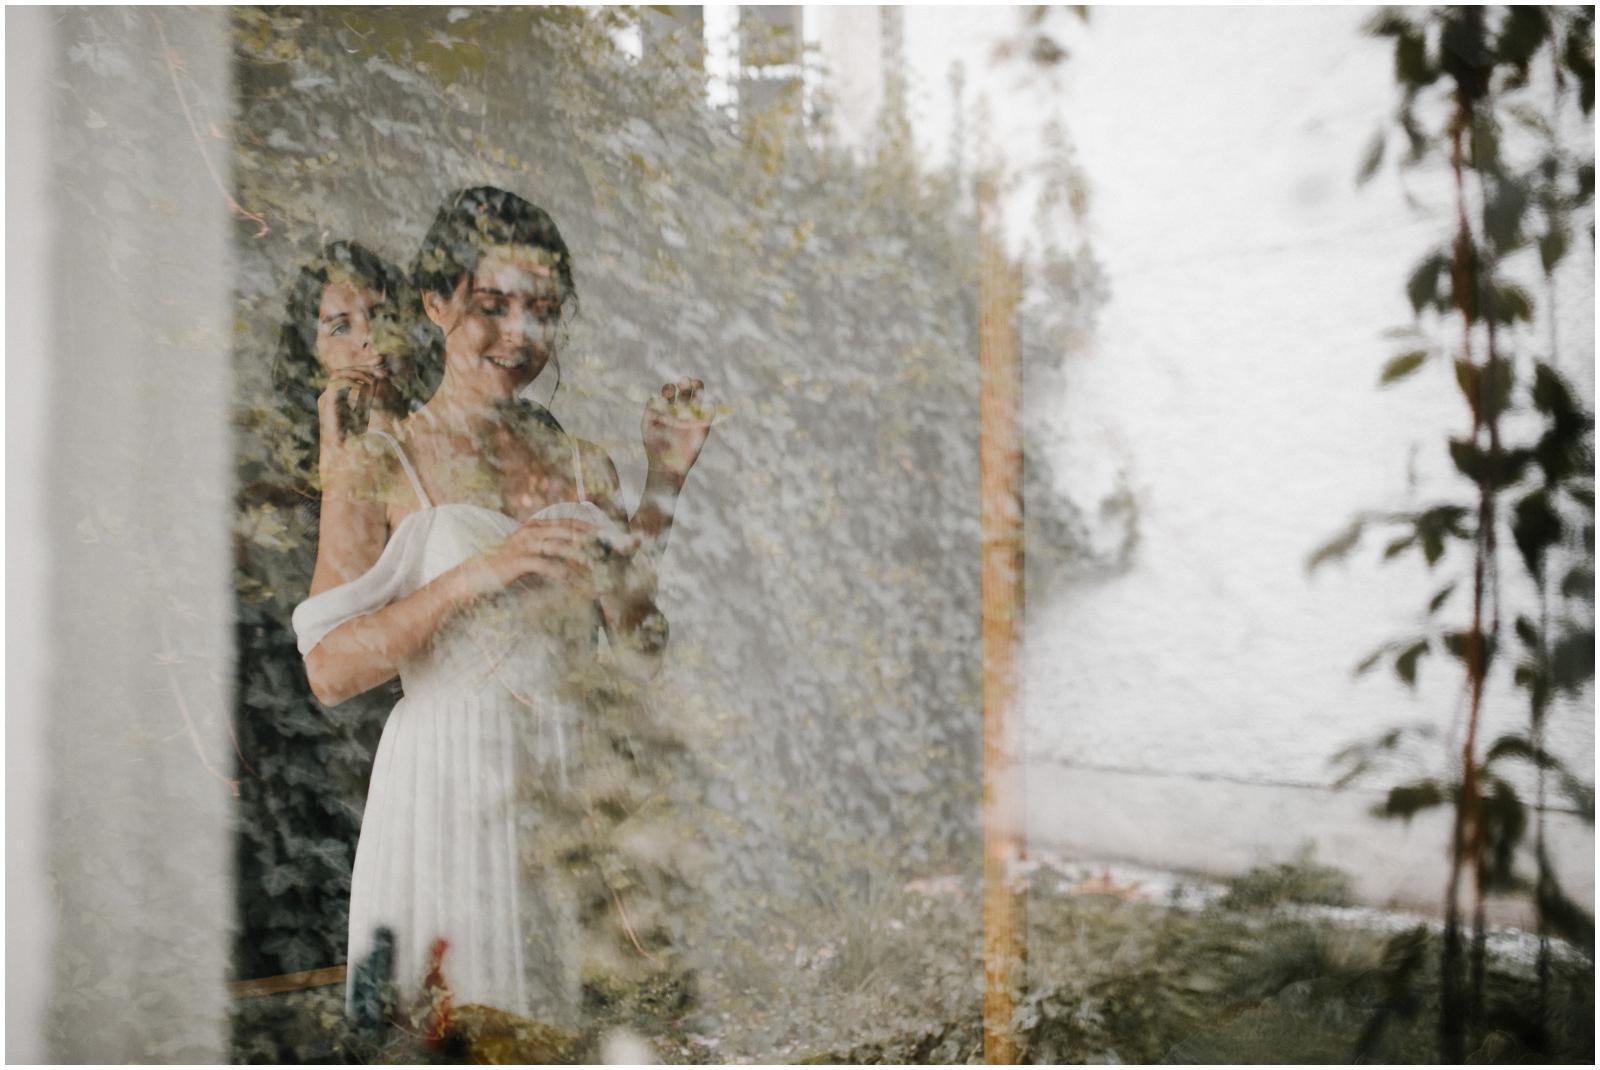 mirjam_thomas_wedding-78.jpg